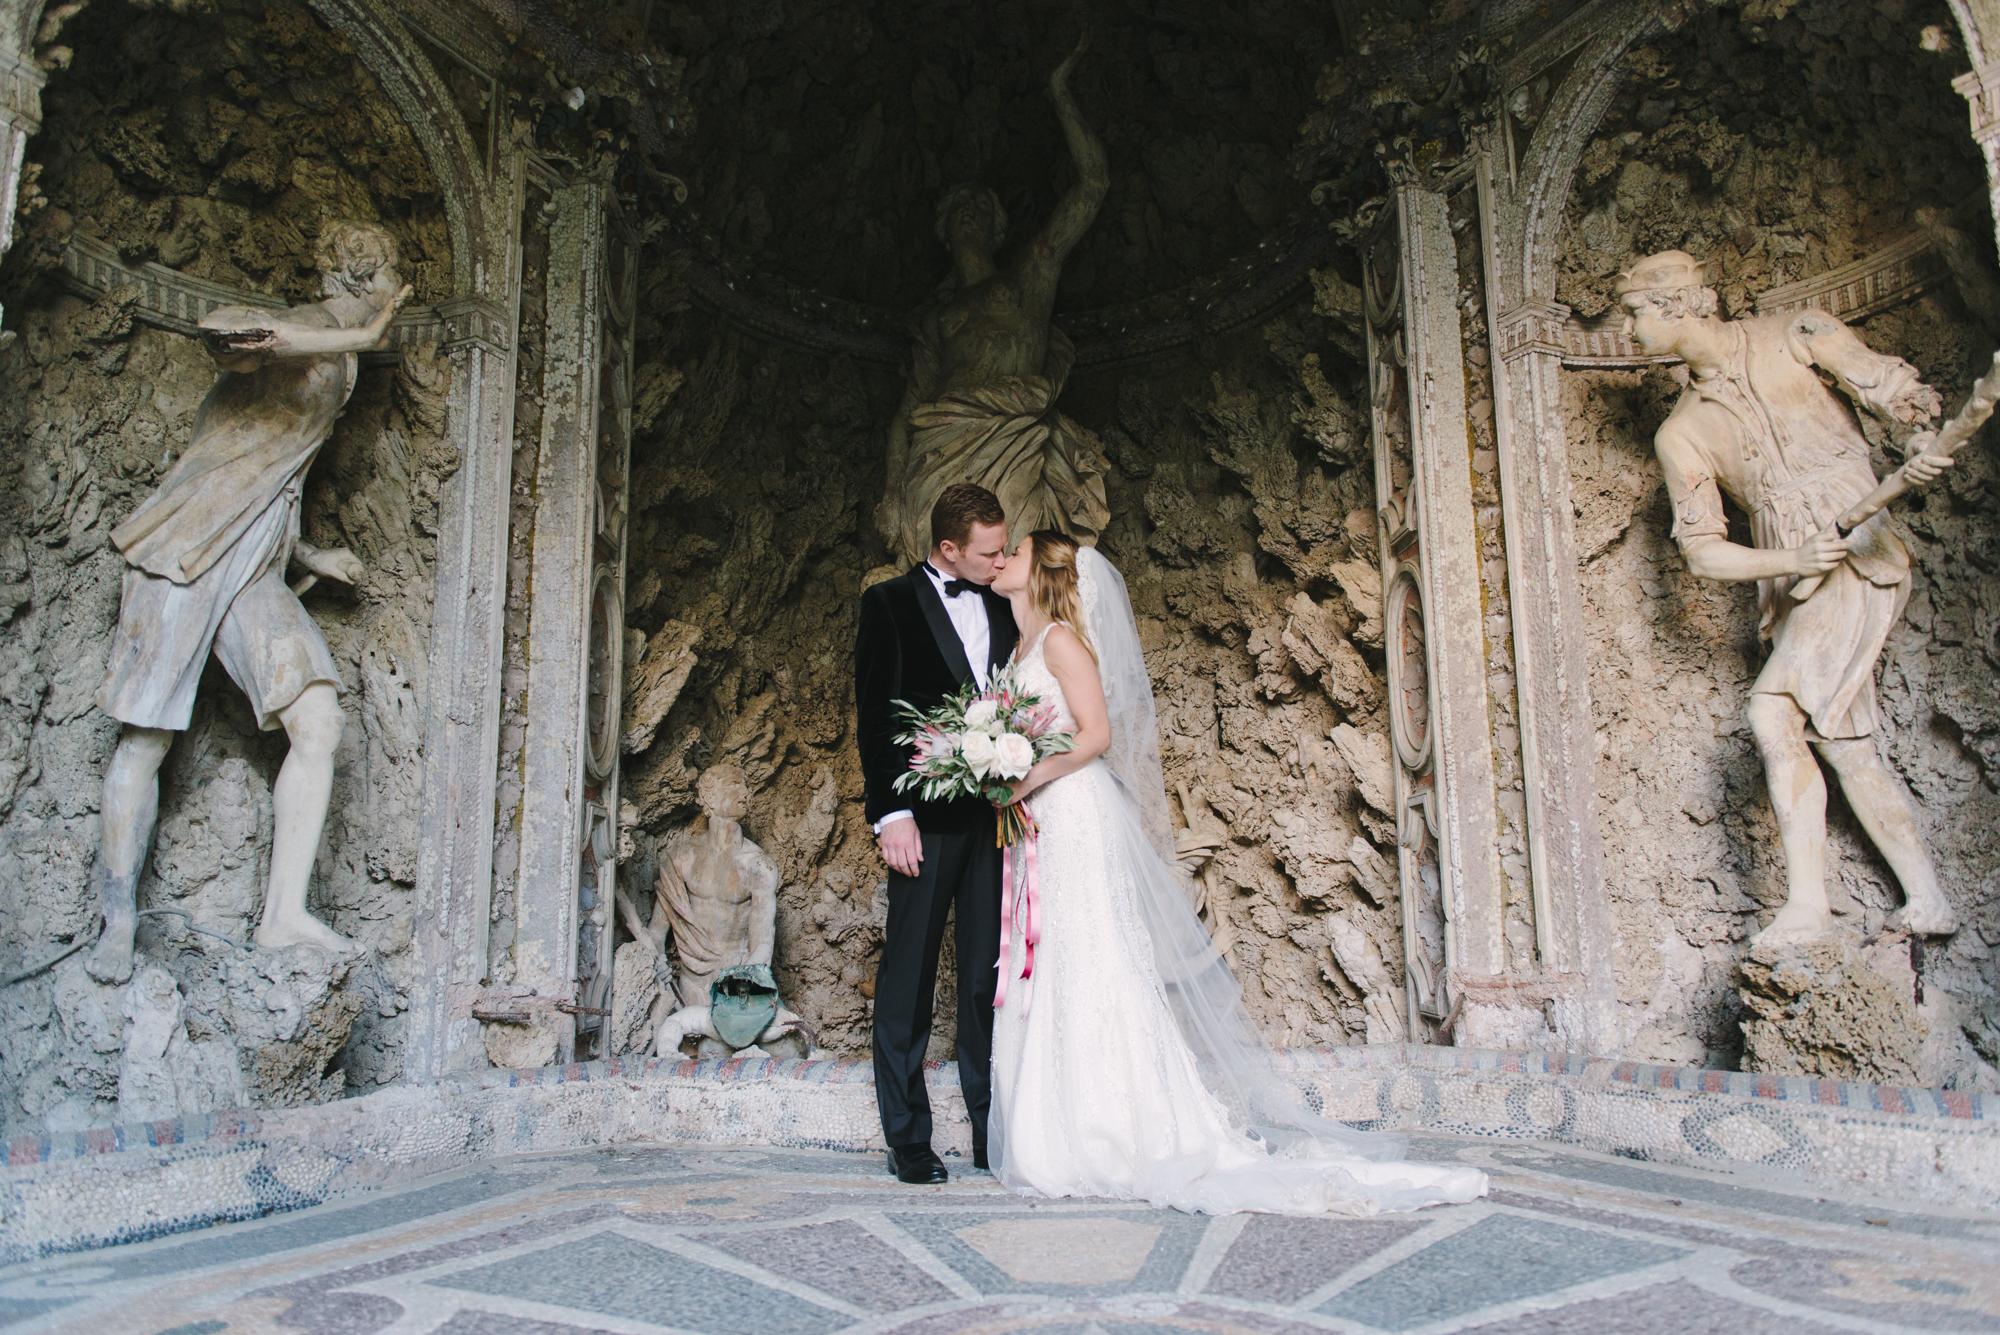 Wedding_Photographer_in_Tuscany_Italy-013.jpg